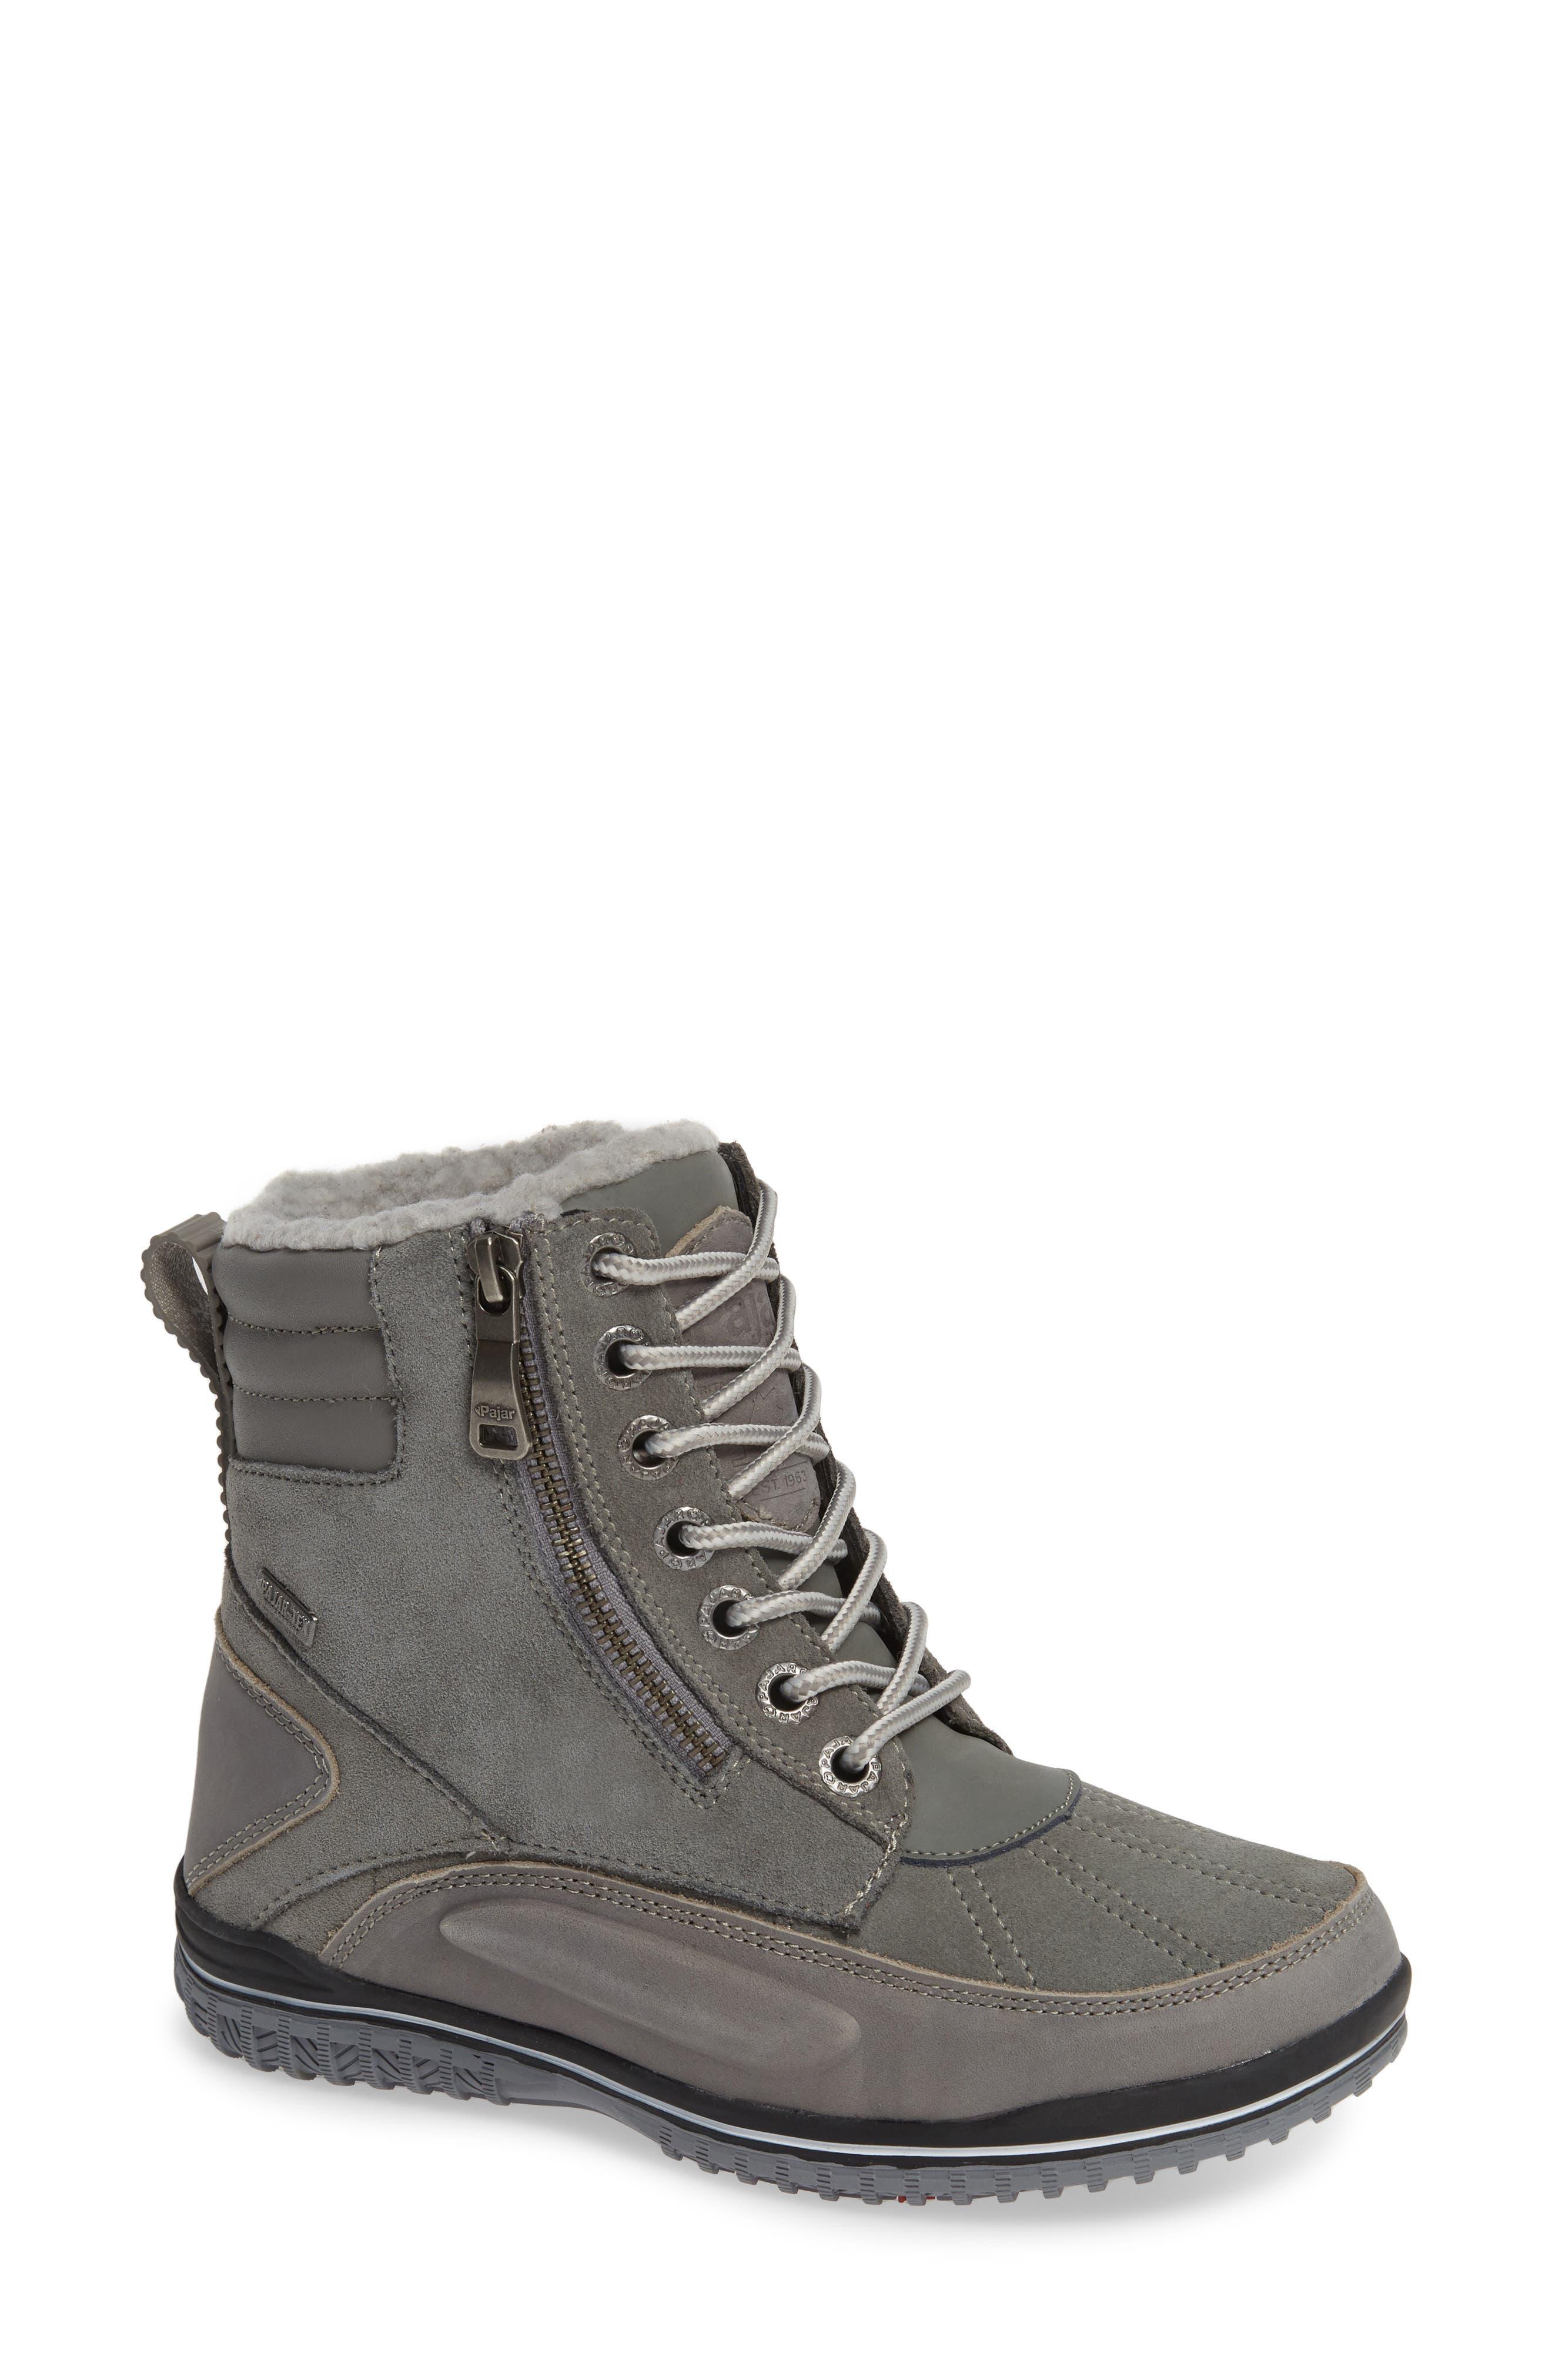 Pajar Jeana Waterproof Winter Boot, Grey